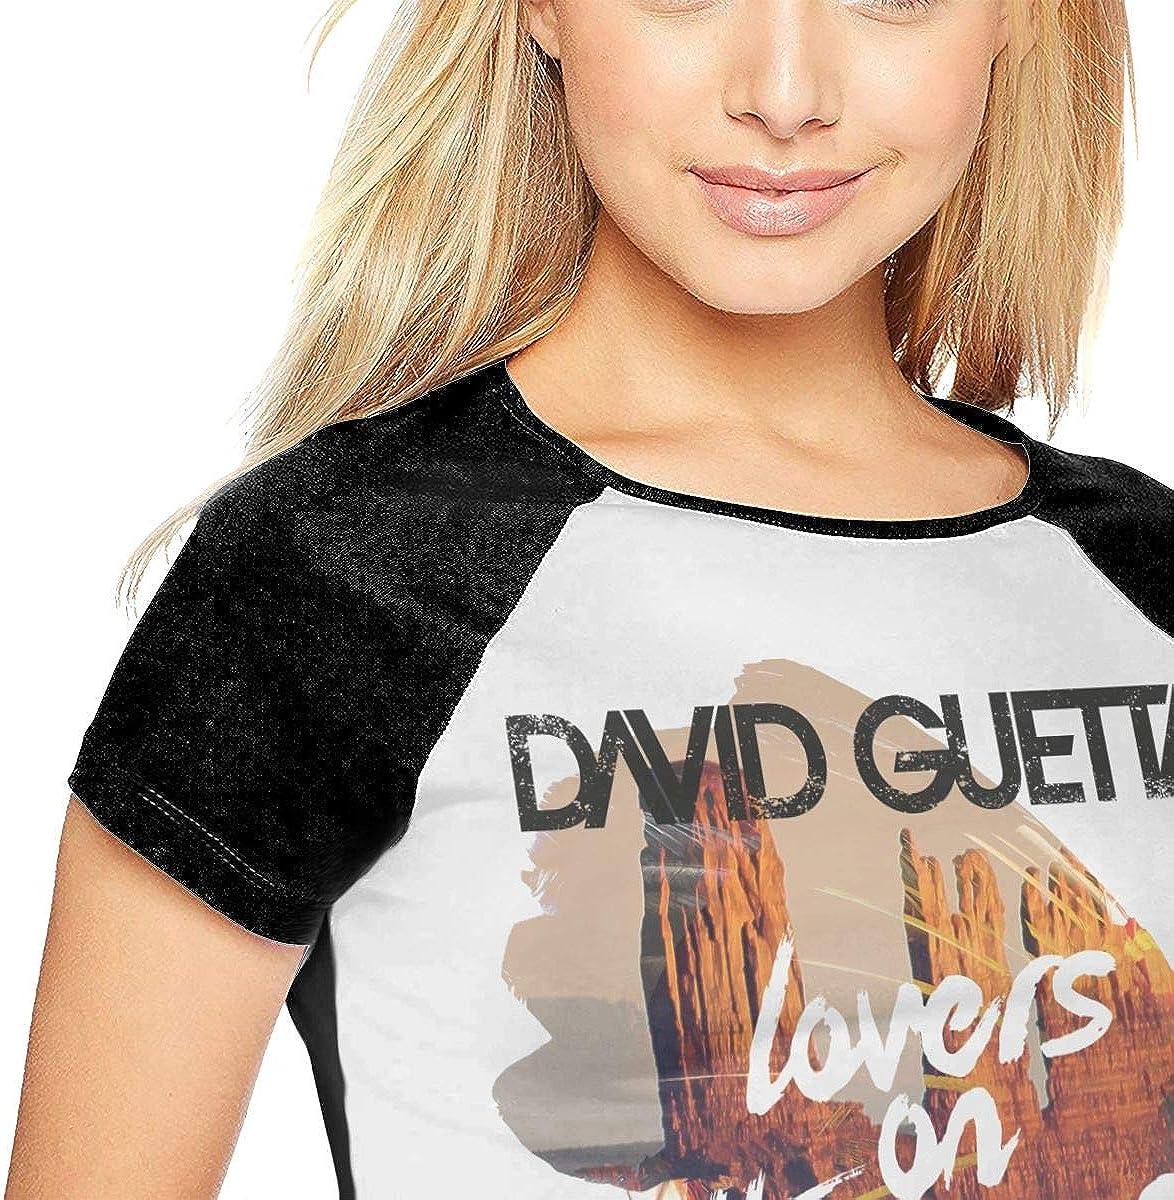 SheyAnsh David Guetta Women Raglan Short Sleeve Casual Print T-Shirts Baseball Blouses